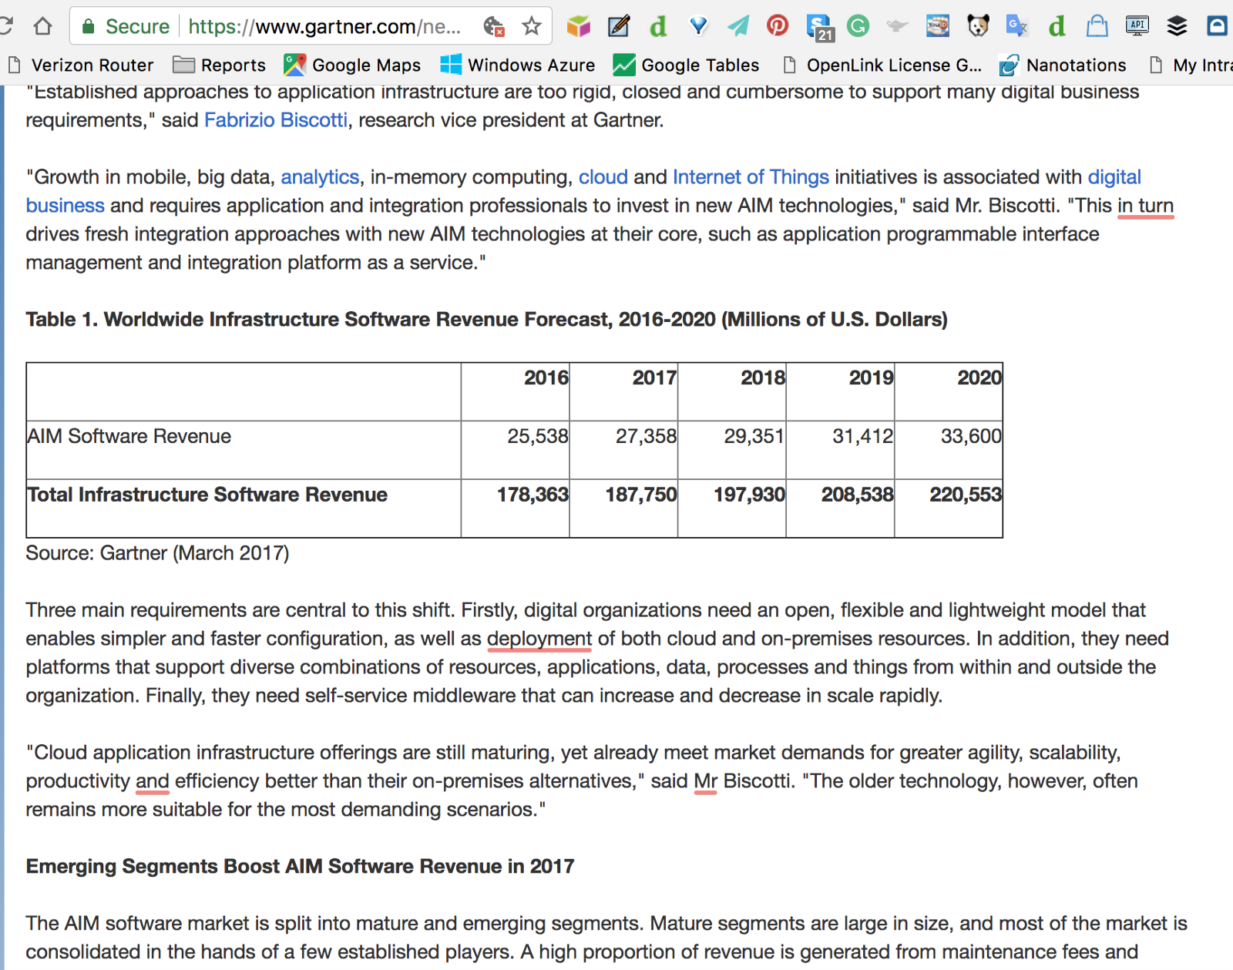 Segmented Turning Spreadsheet Within Maintaining A Google Spreadsheet About Market Segmentation, Dynamically